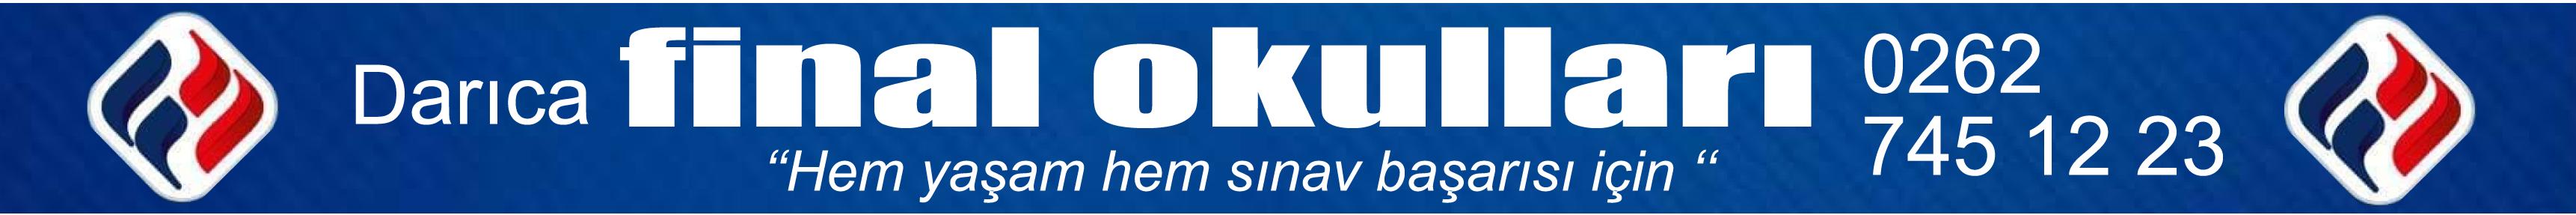 Reklam